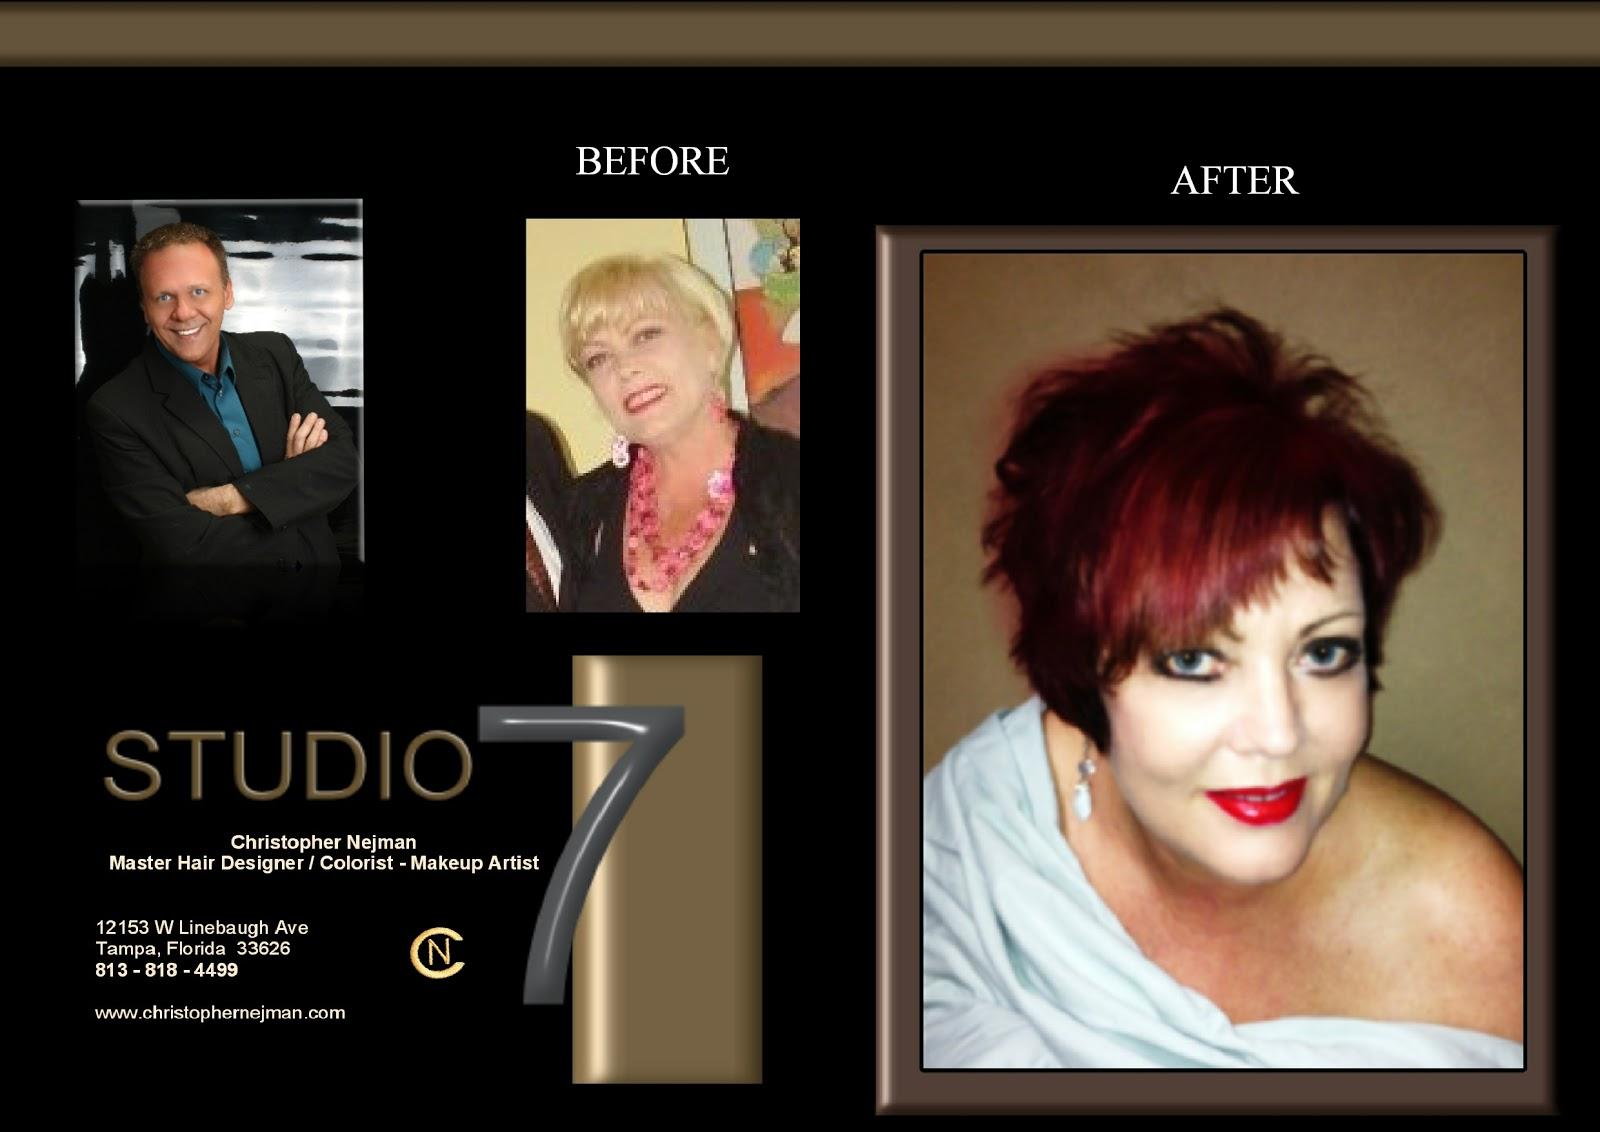 Christophernejman westchase hair salon tampa florida - Christophe hair salon ...